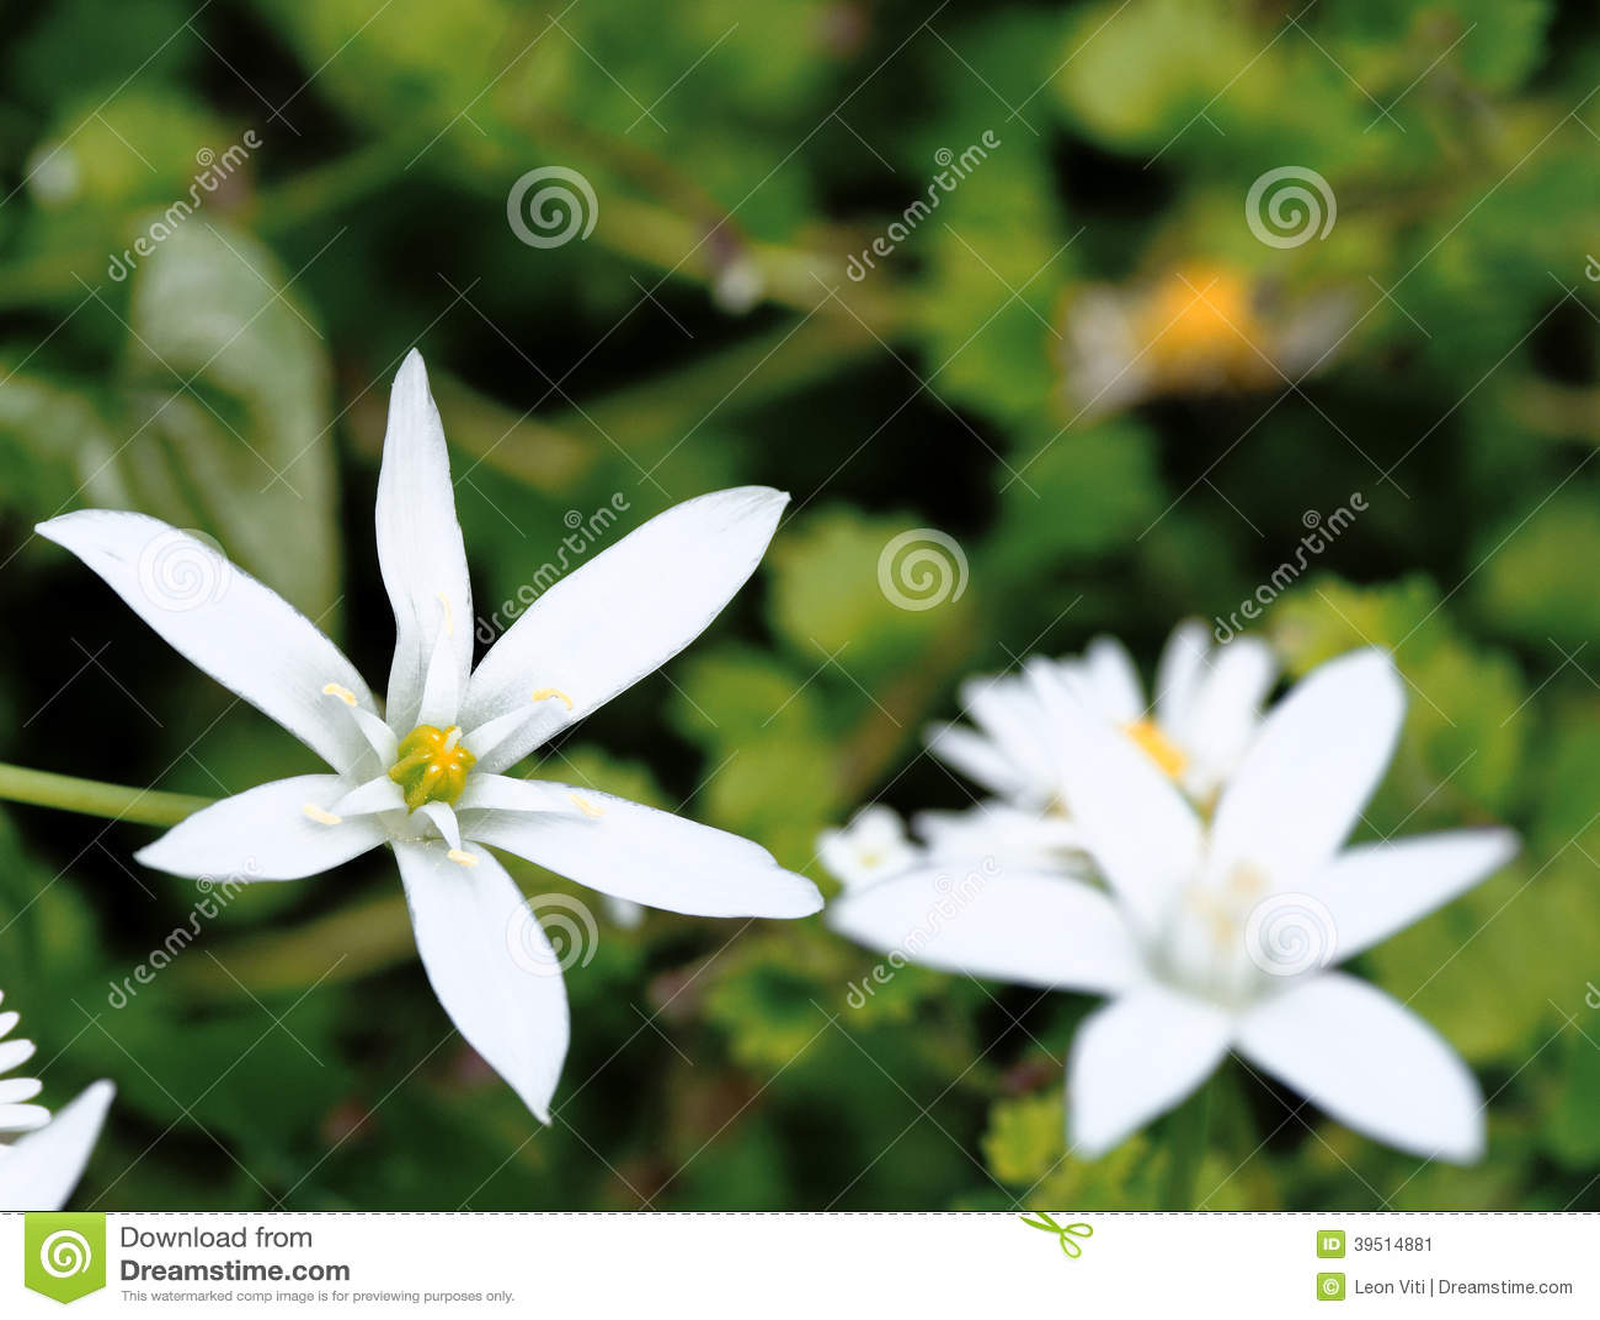 Star of Bethlehem Ornithogalum umbellatum